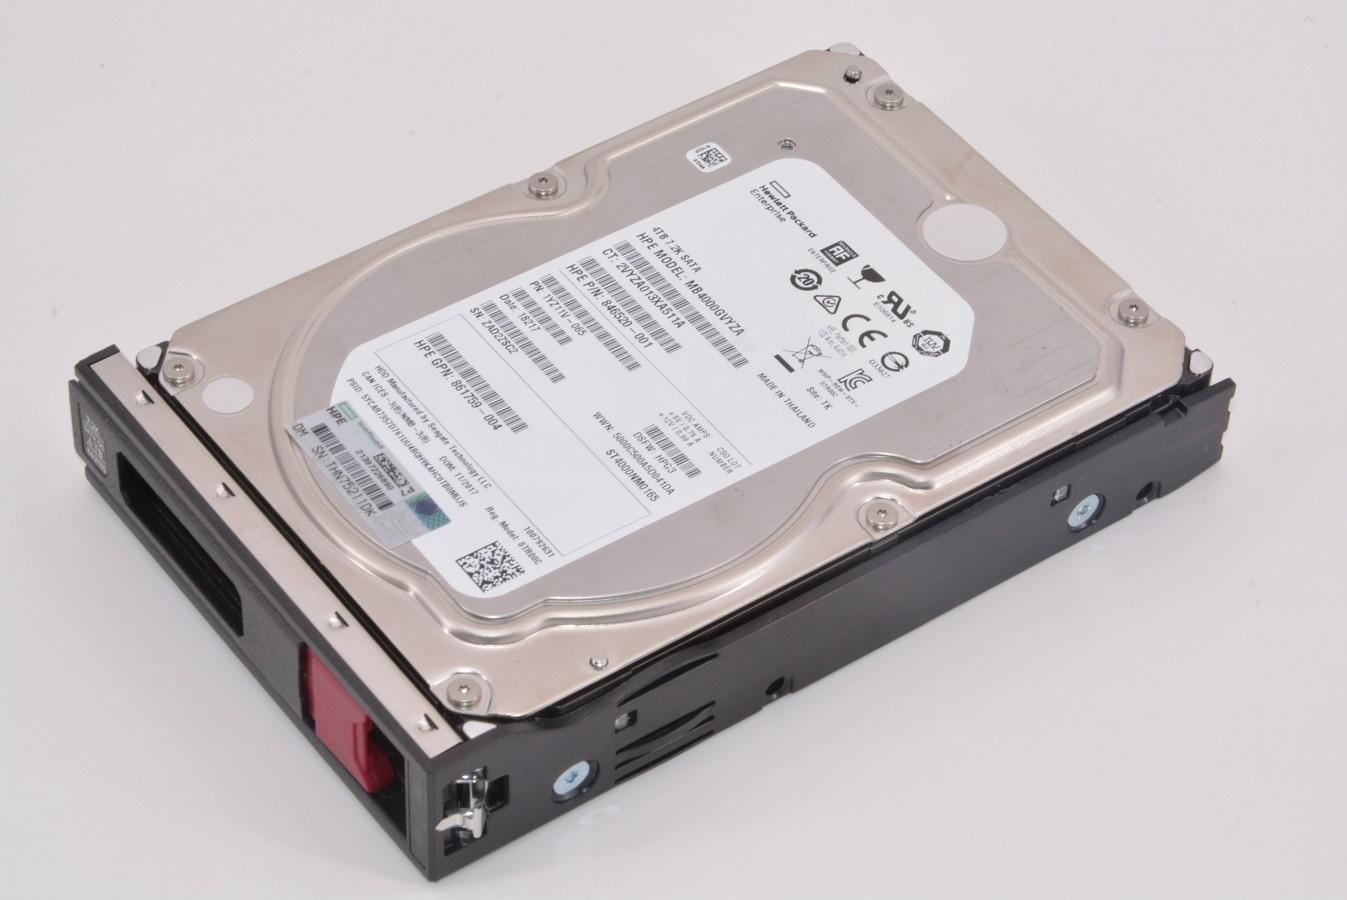 Seagate 4TB Hp  ST4000NM0165 7200RPM Sata 6GB/s 3.5 Internal Hot Swap Hard Drive